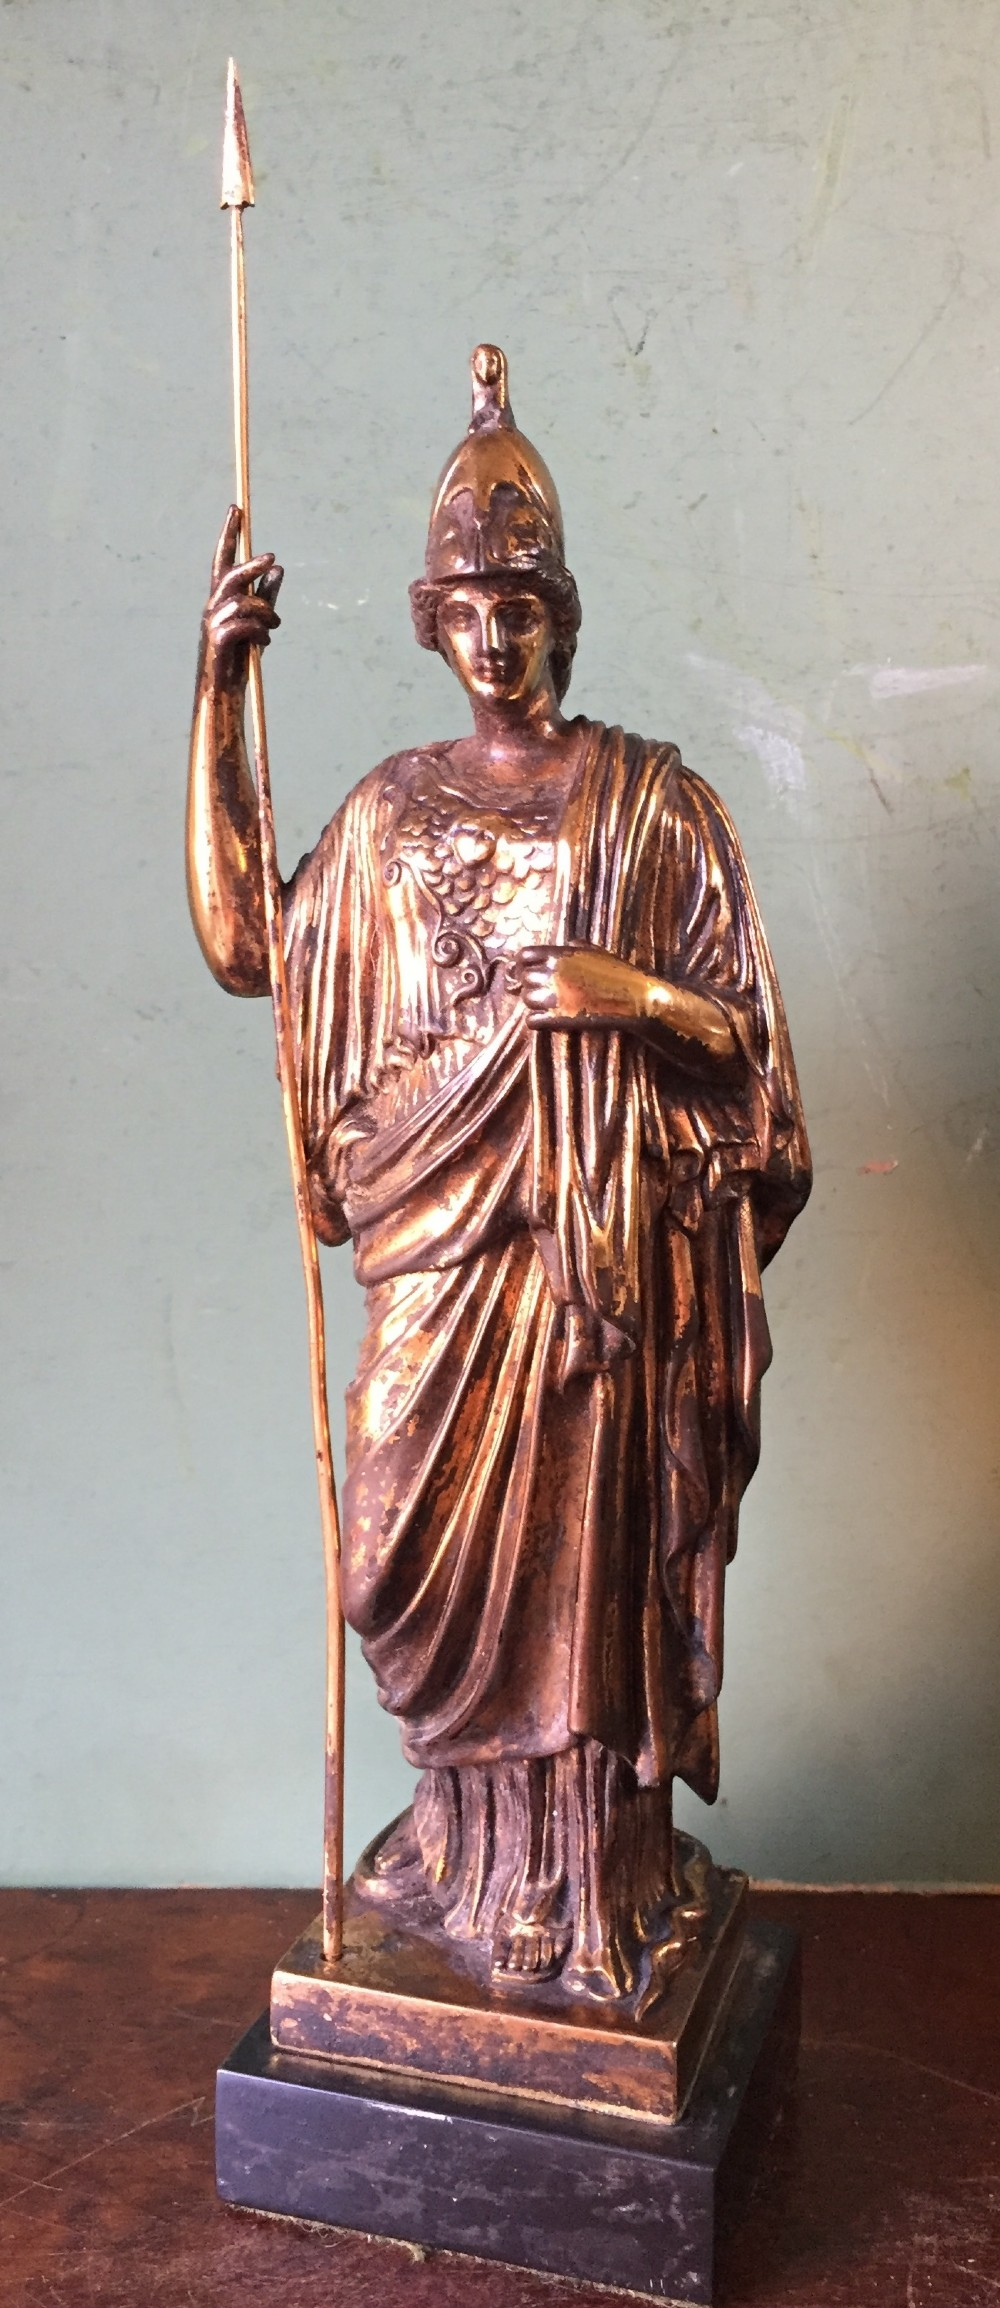 c19th gilded bronze classical 'grand tour' souvenir after the antique of athena